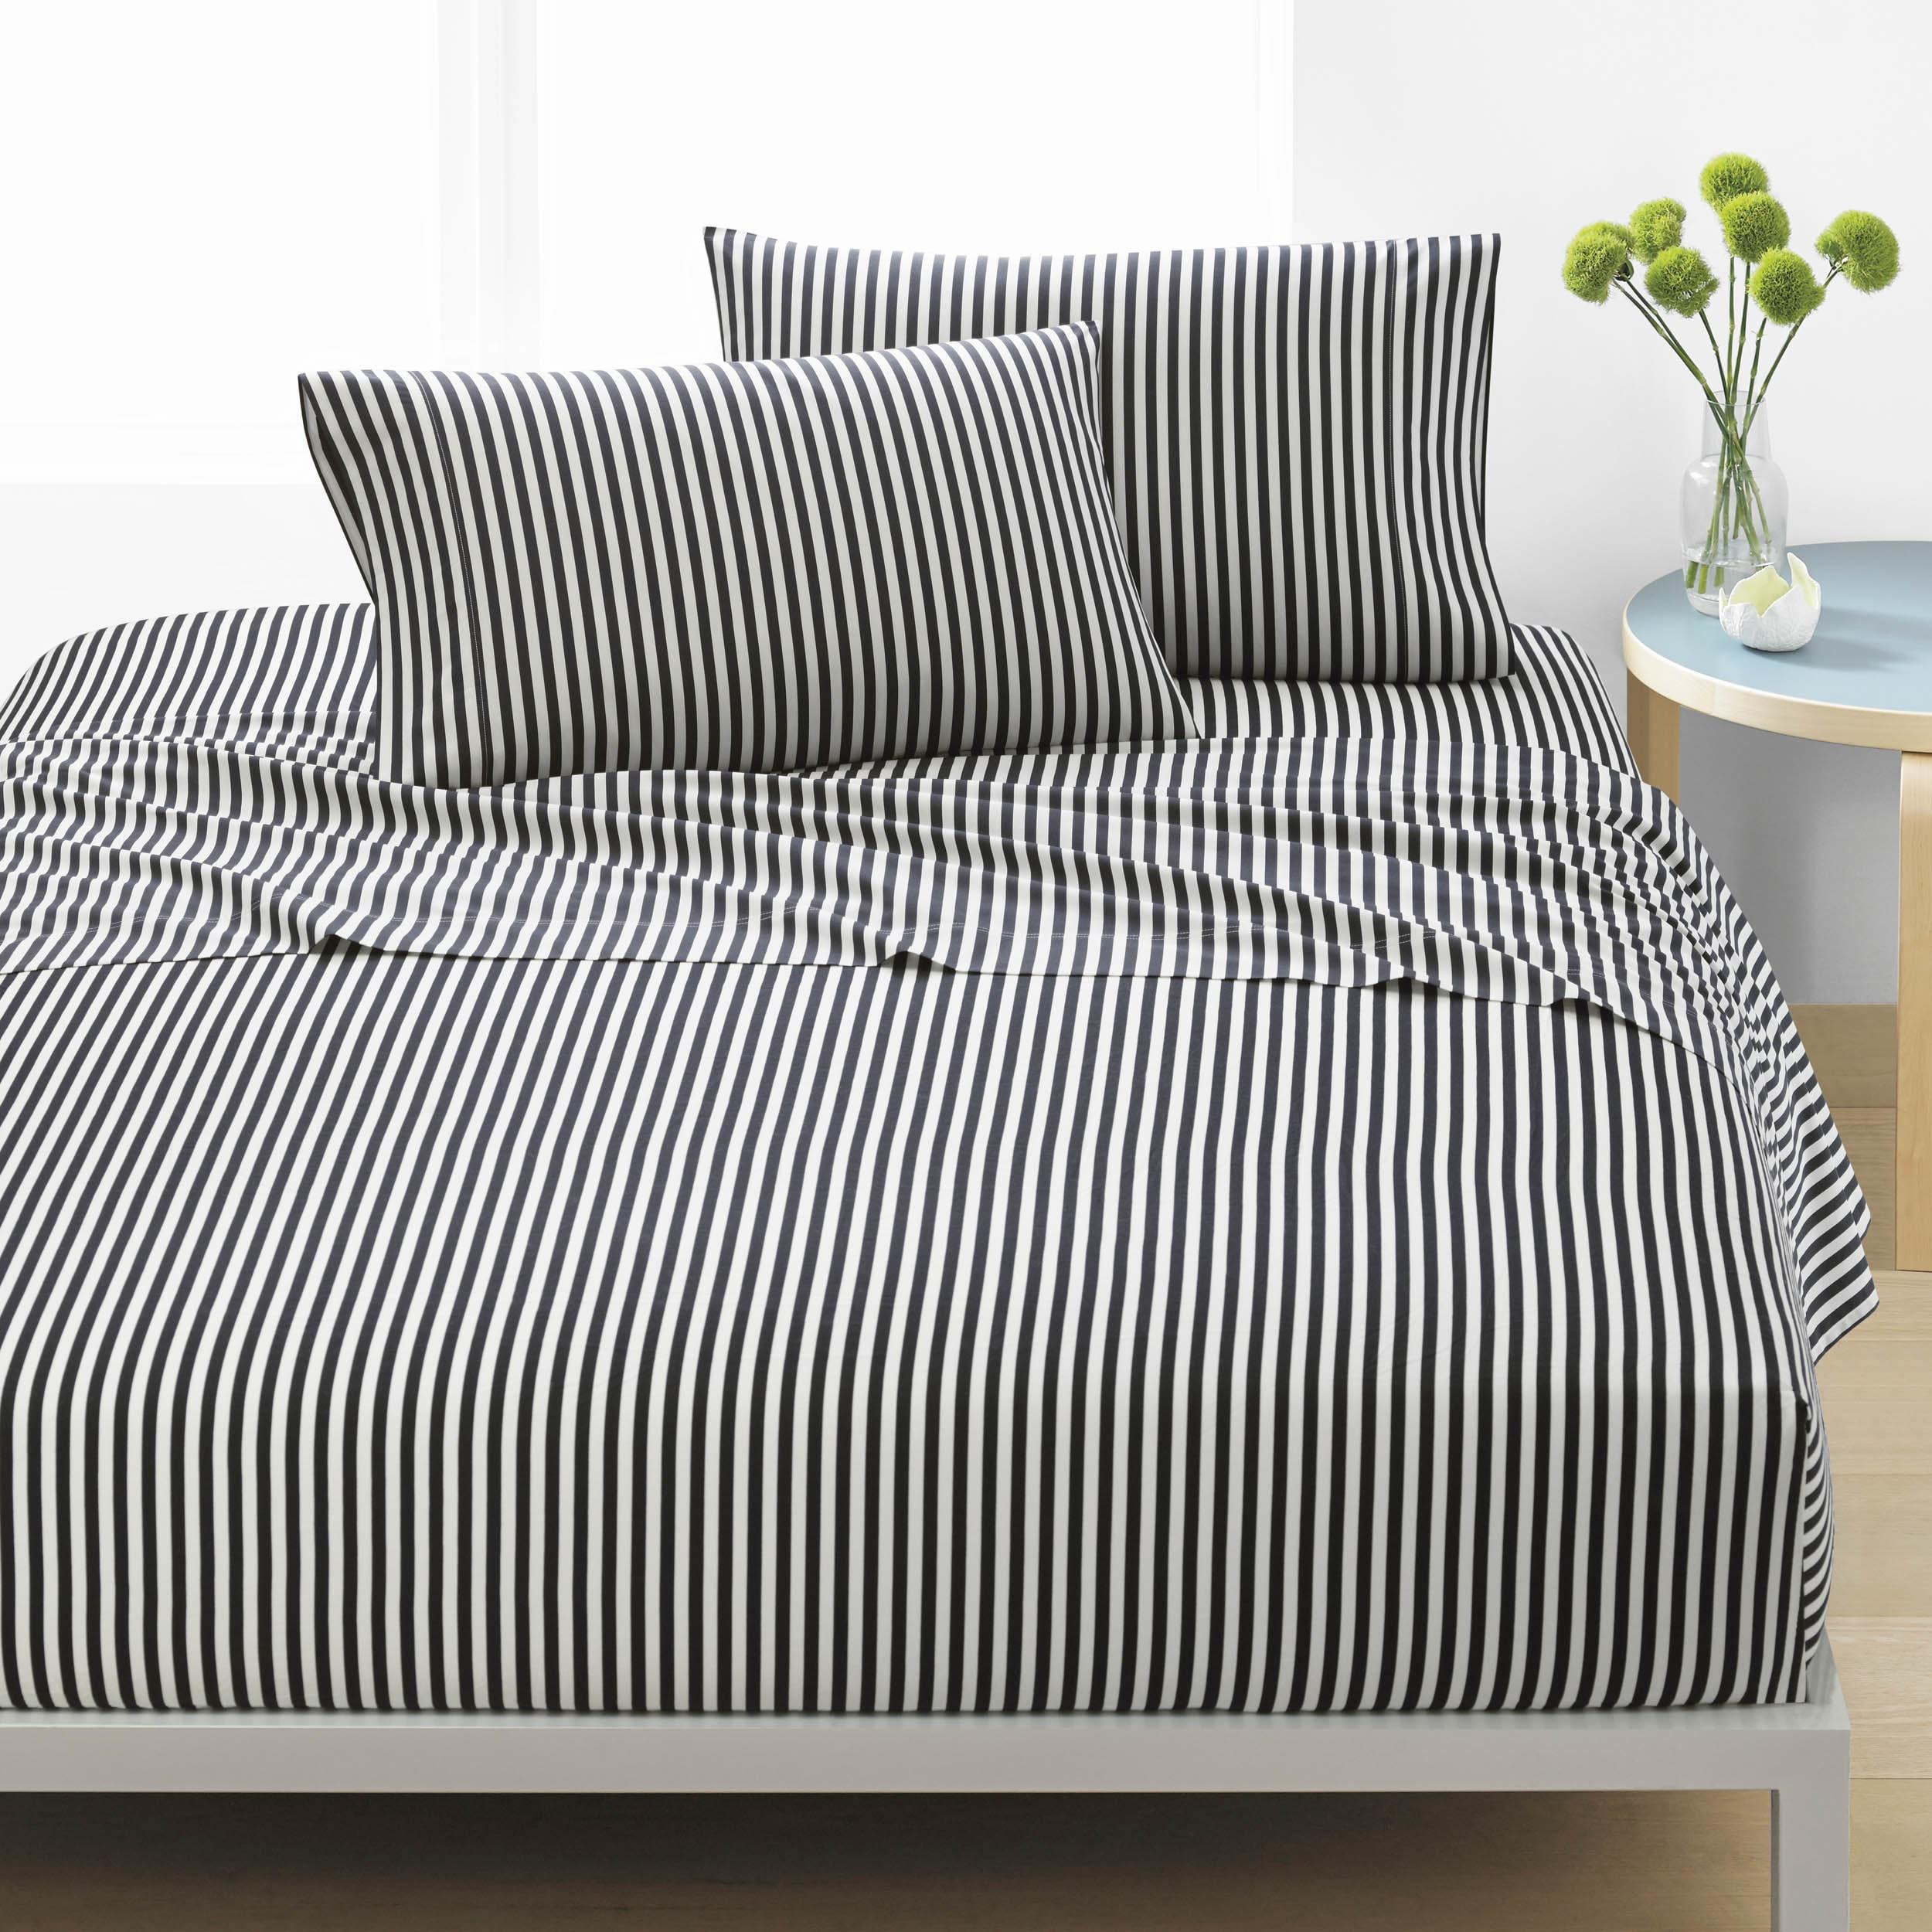 comforter product bedding set shipping kaivo overstock marimekko bed today bath free